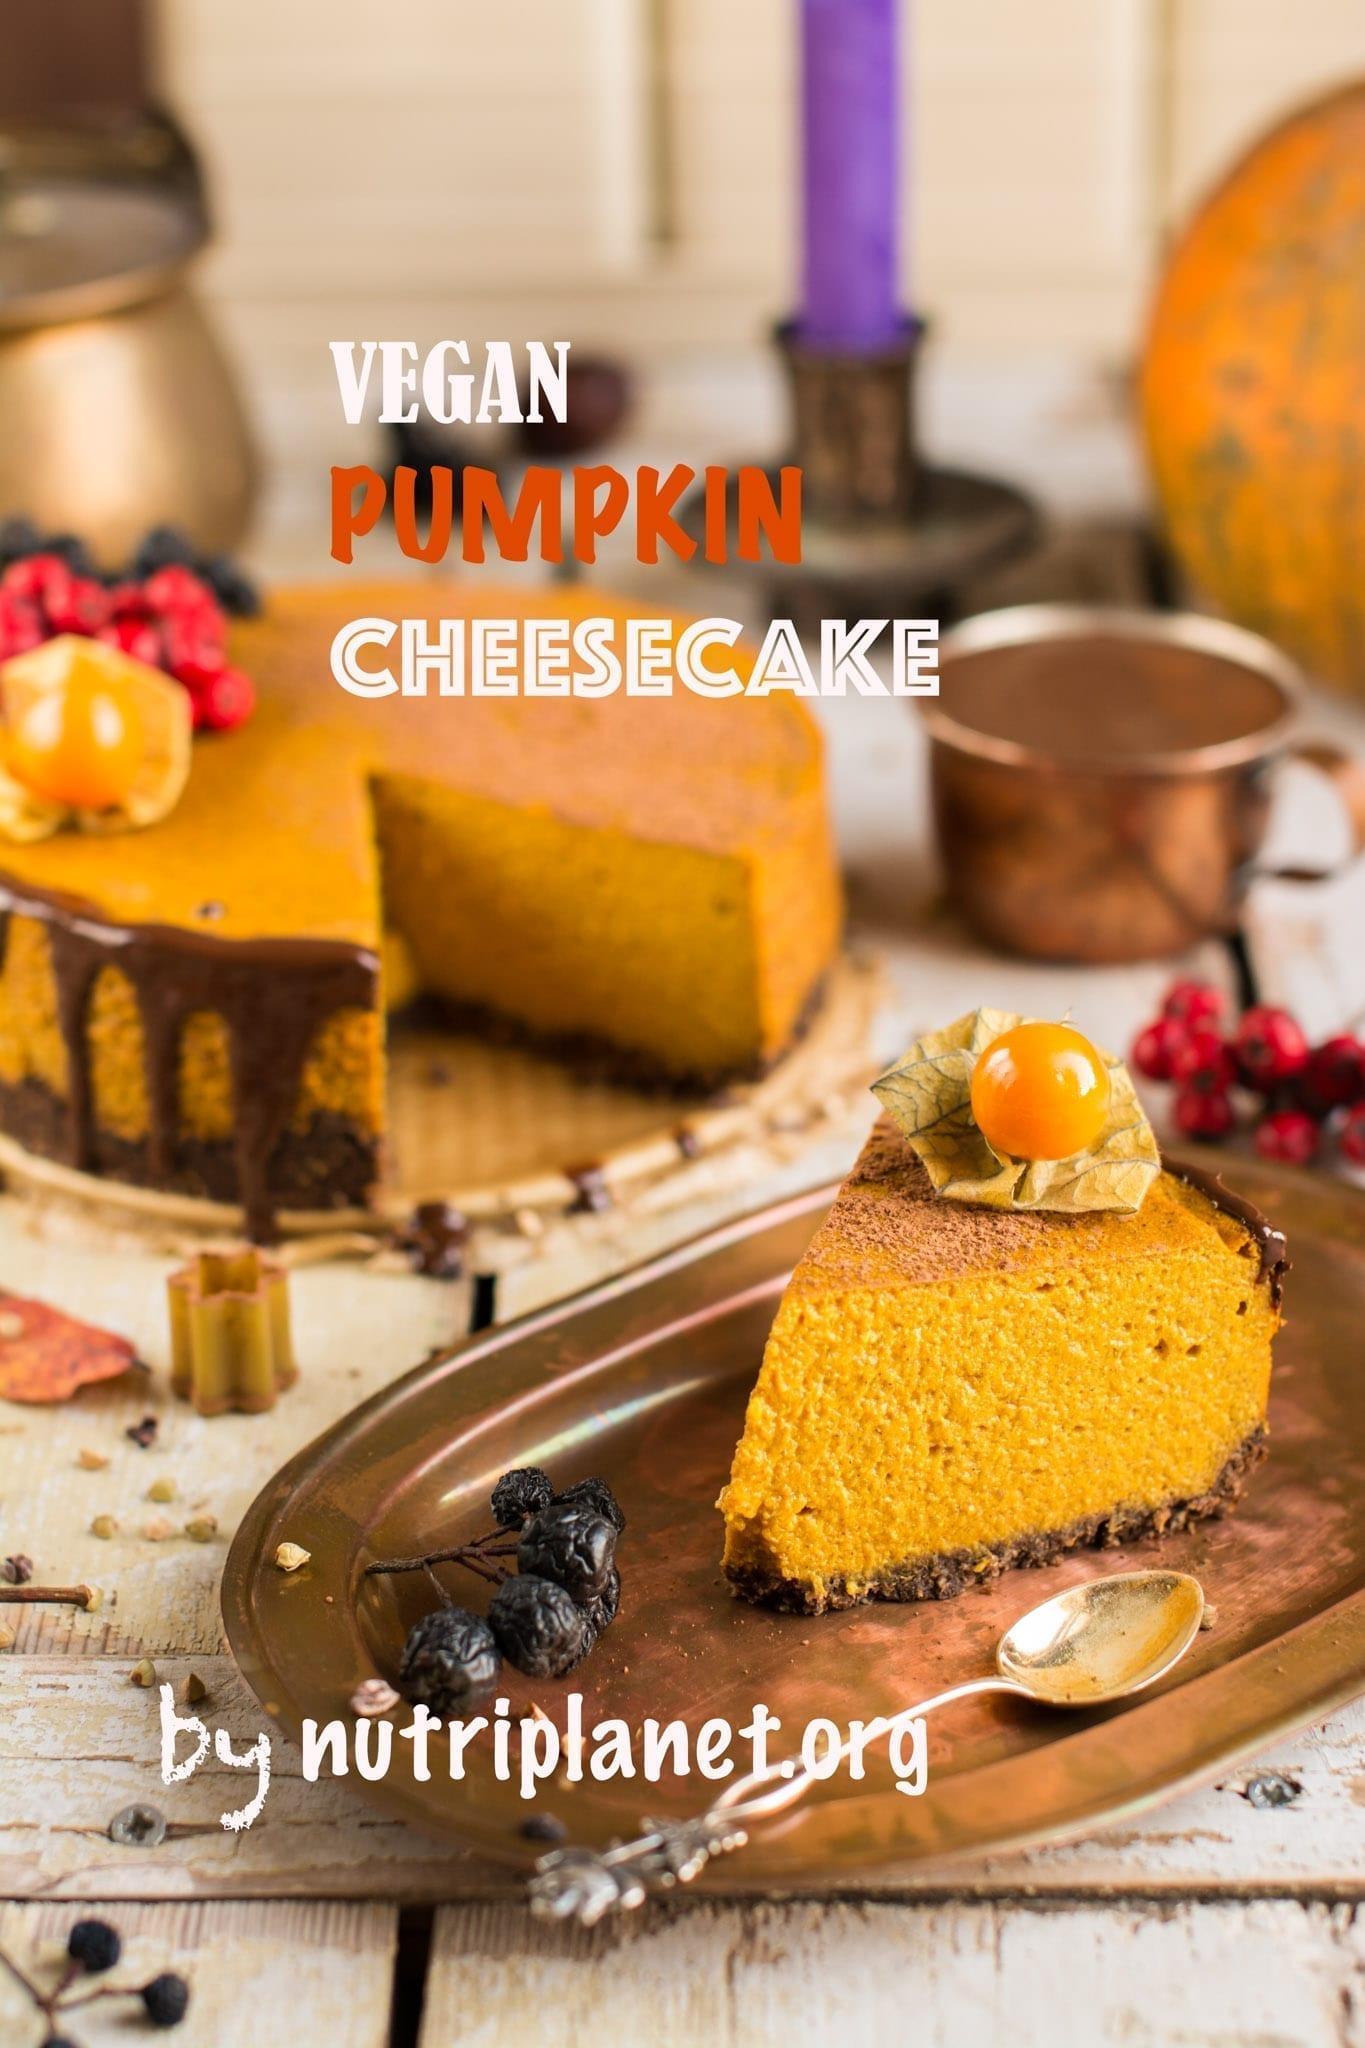 Vegan Pumpkin Cheesecake with Silken Tofu